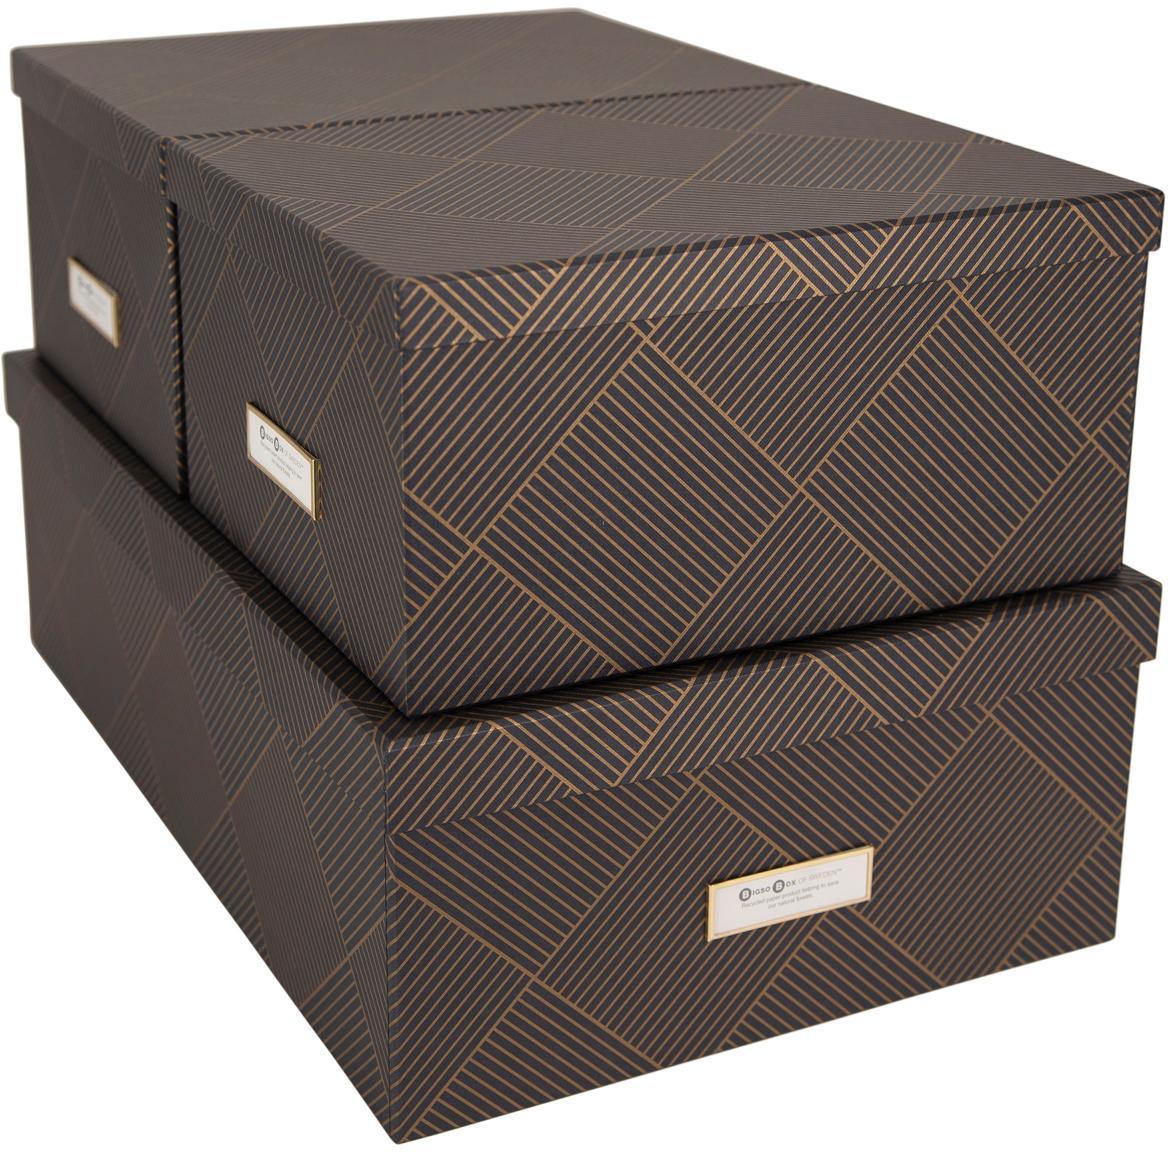 Set de cajas Inge, 3pzas., Caja: cartón laminado, Dorado, gris oscuro, Tamaños diferentes